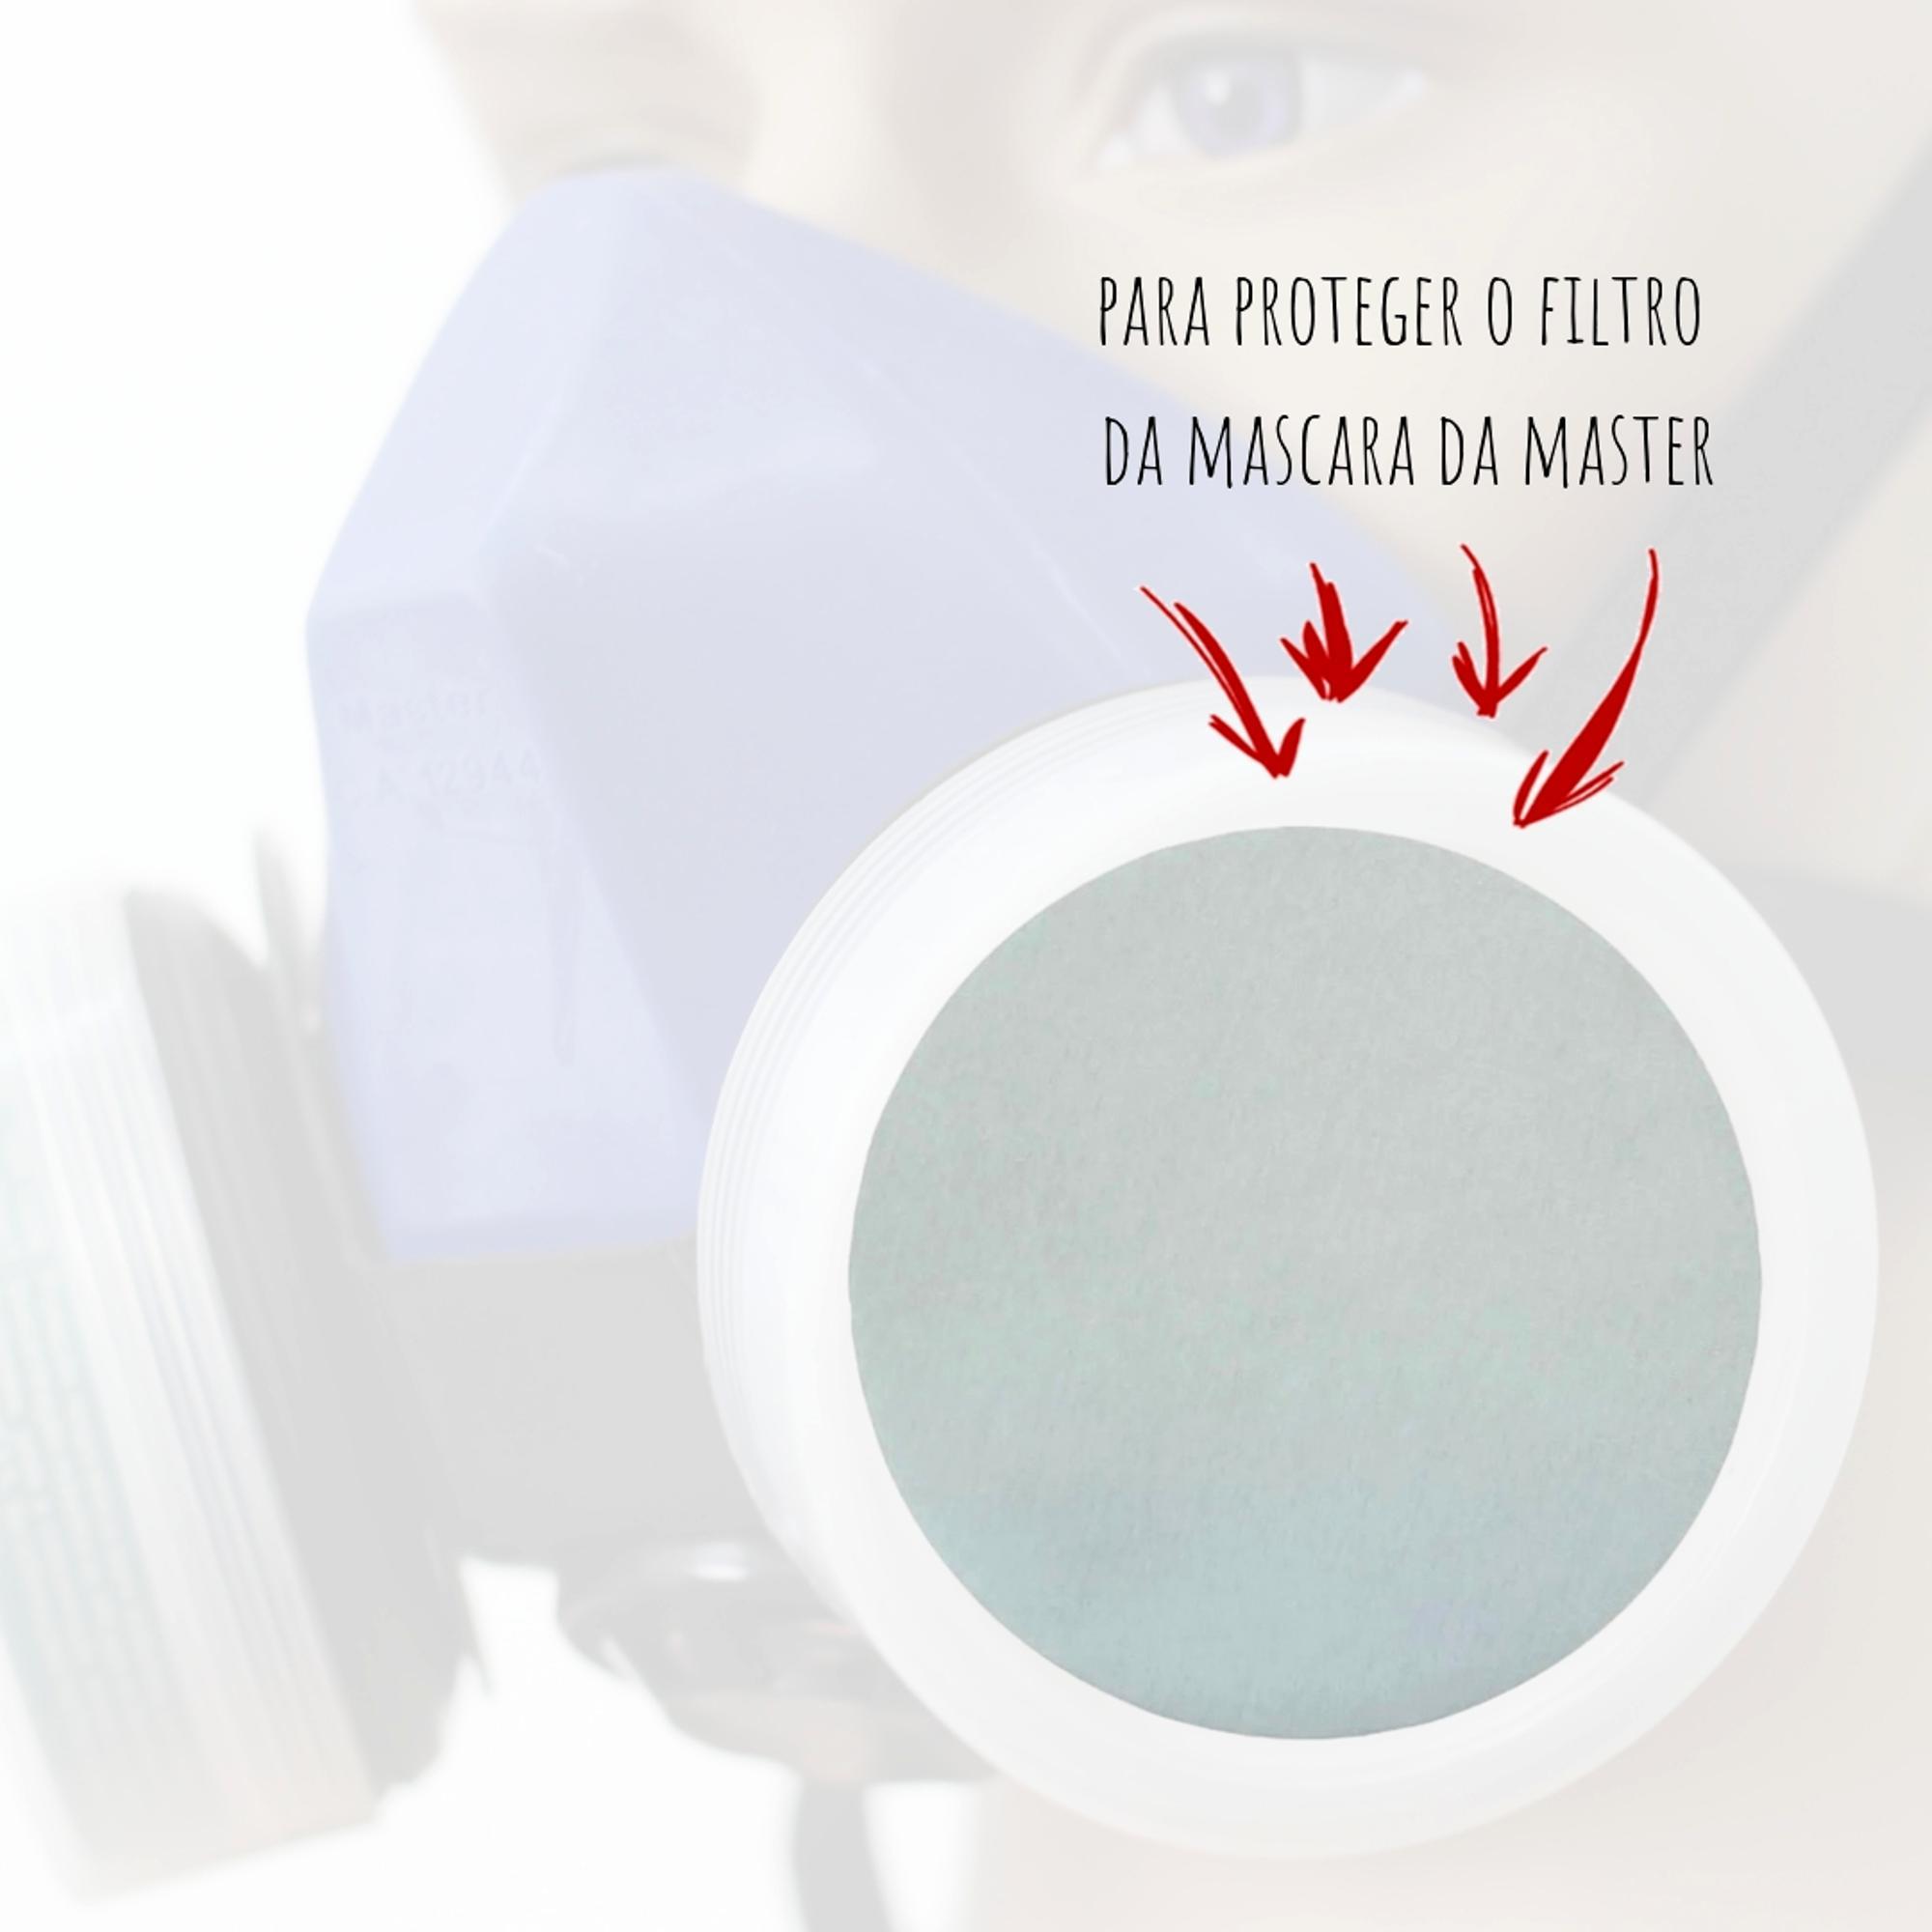 PRE-FILTRO PARA MÁSCARA TOP AIR IV - EMBALAGEM 12 PCS MASTER  - DE PAULA EPI